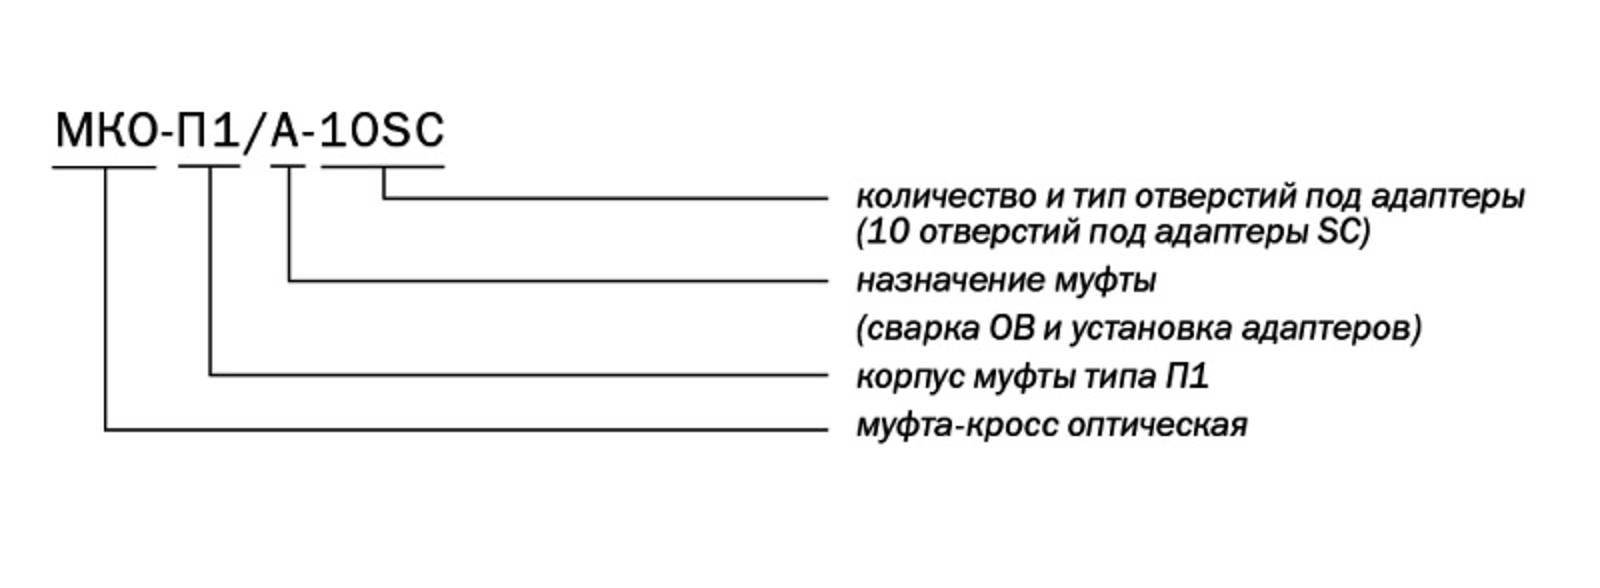 Муфта-кросс МКО-П1/A-10SC